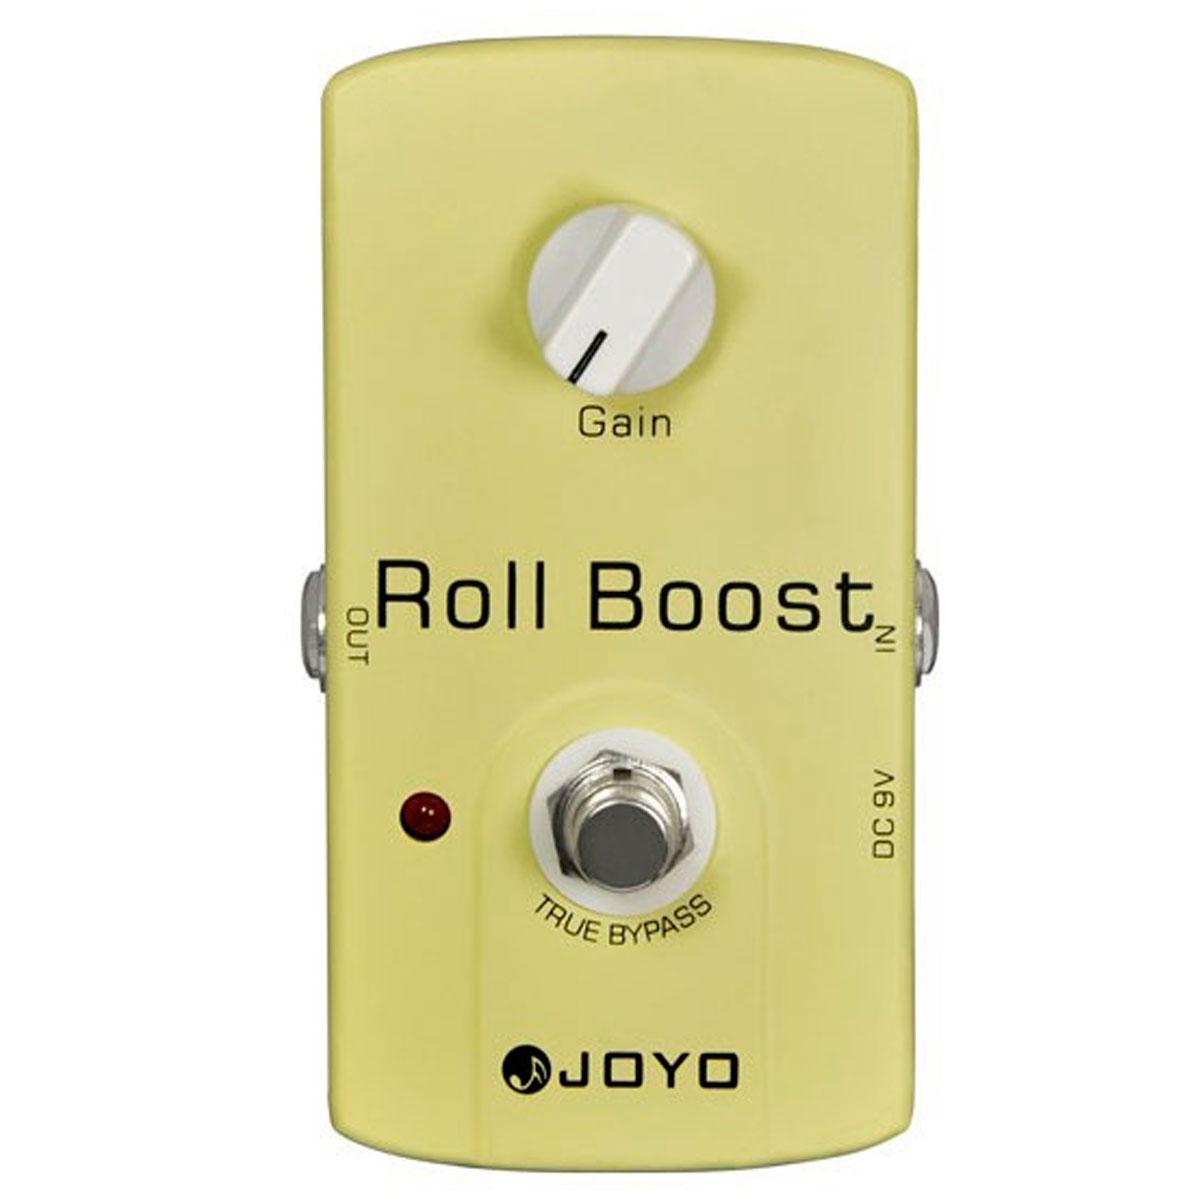 Pedal Boost p/ Guitarra - JF 38 Joyo